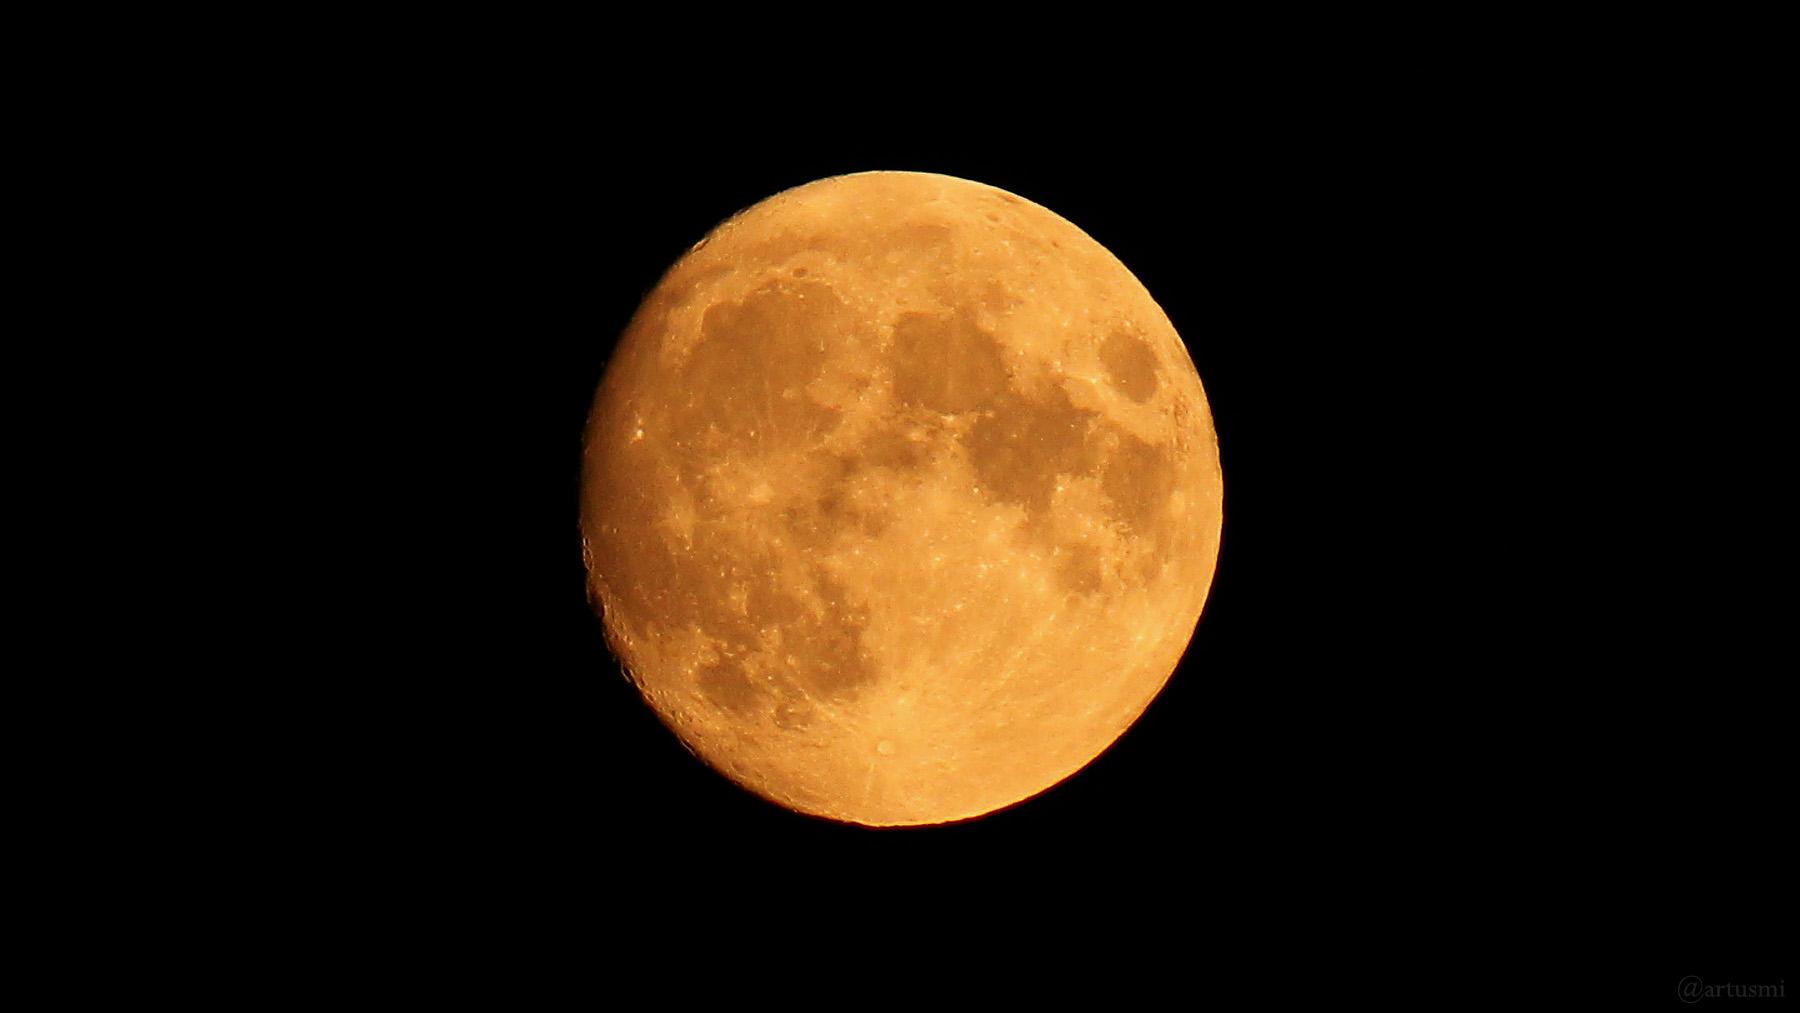 Zunehmender Mond am 22. Juli 2021 um 22:22 Uhr